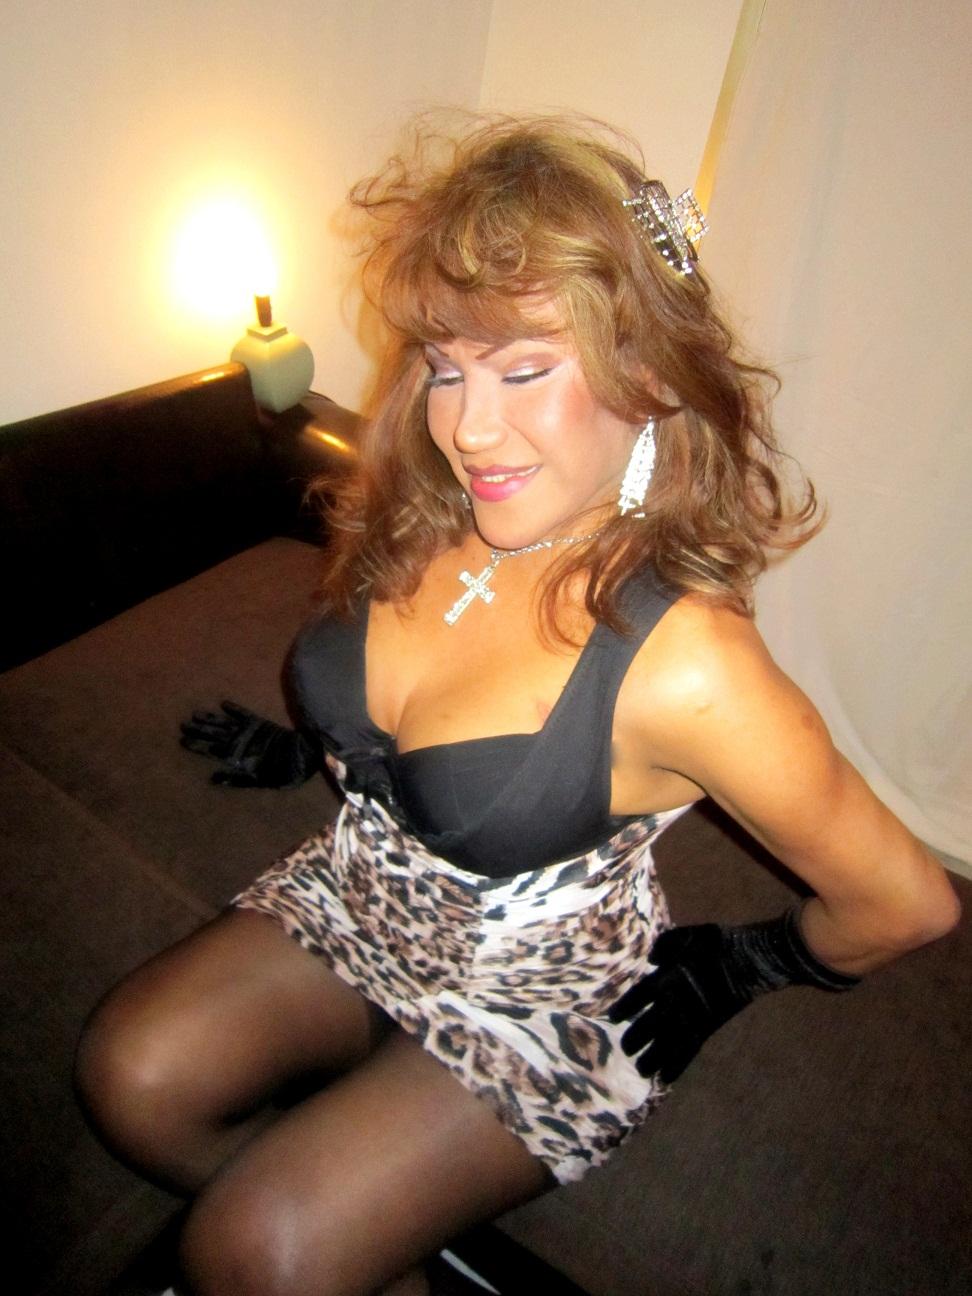 video trans gratuit trans escort nice